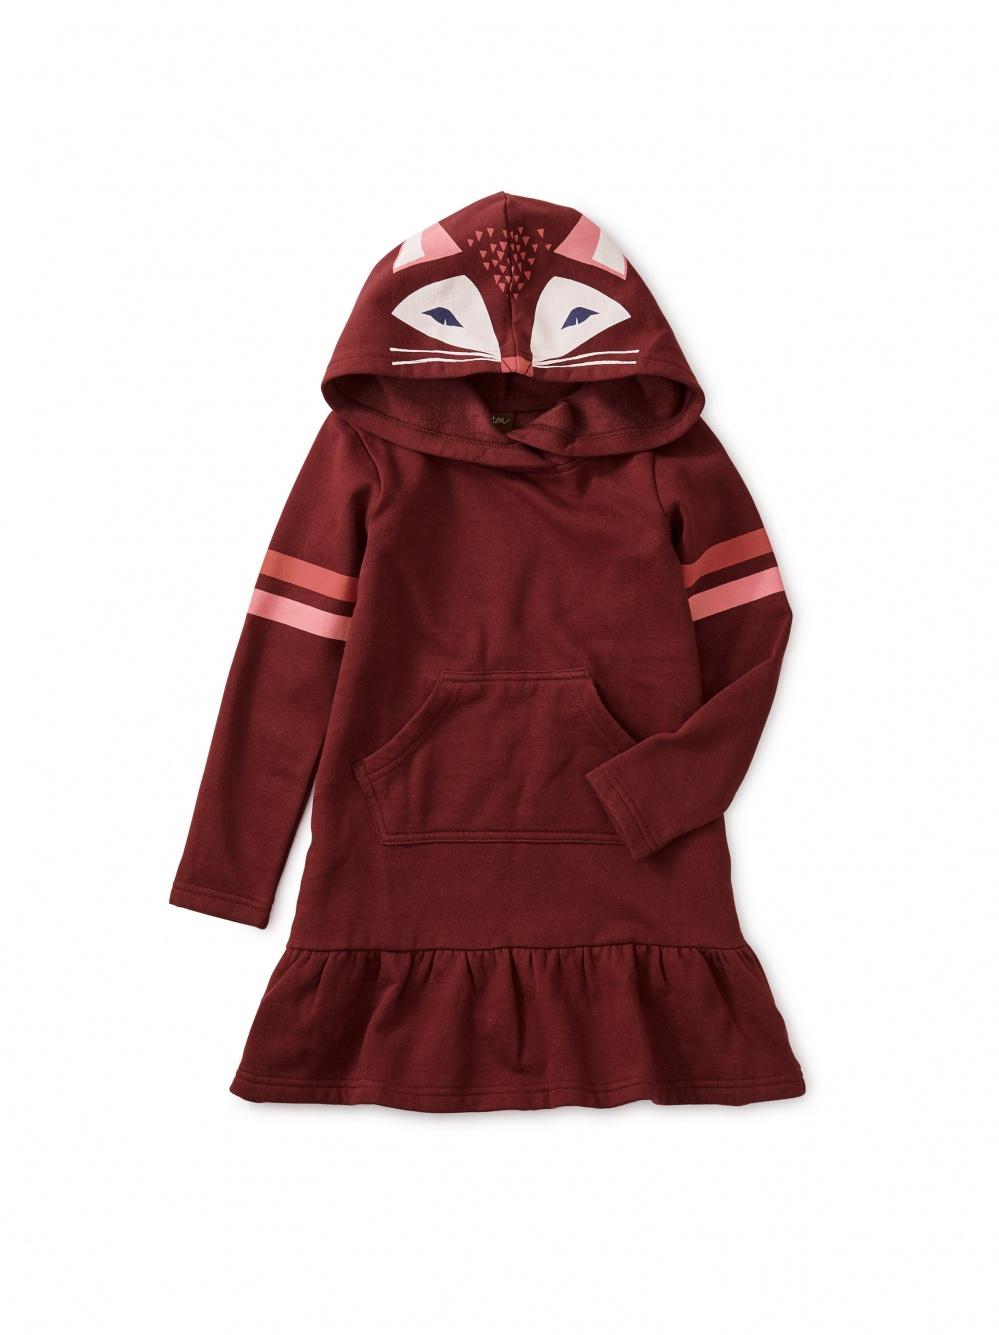 Fox Hooded Sweatshirt Dress